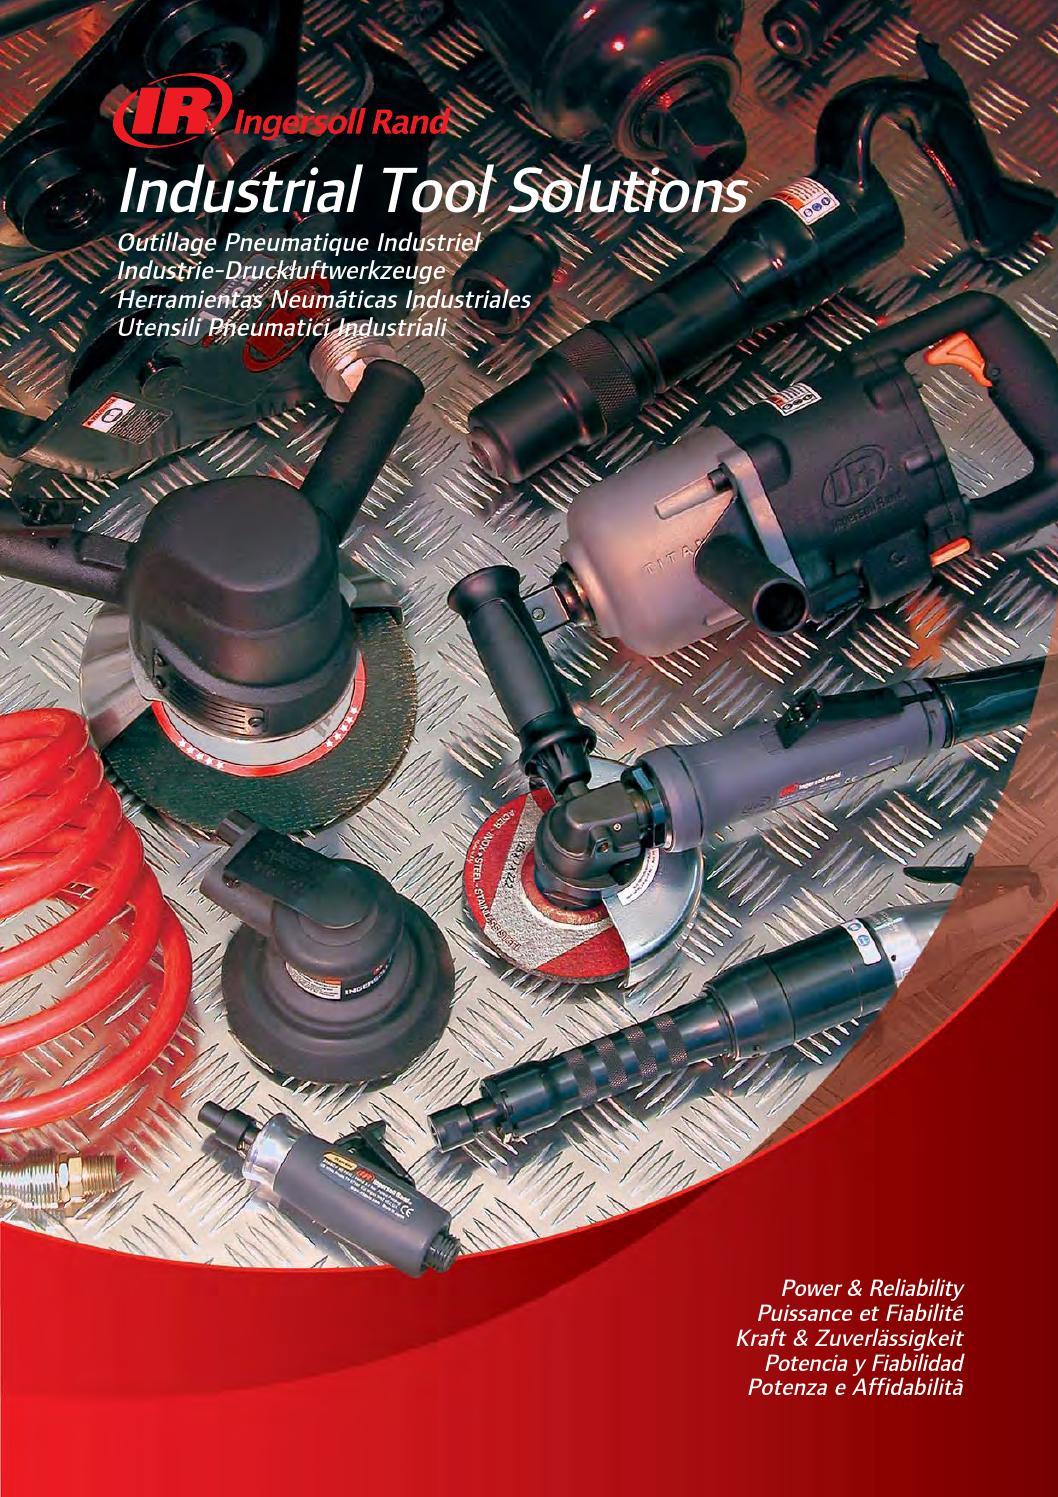 B-Ware 1234 9 pezzi set T-manico 2-12mm Interno Esagonale Ball Point Hex Set